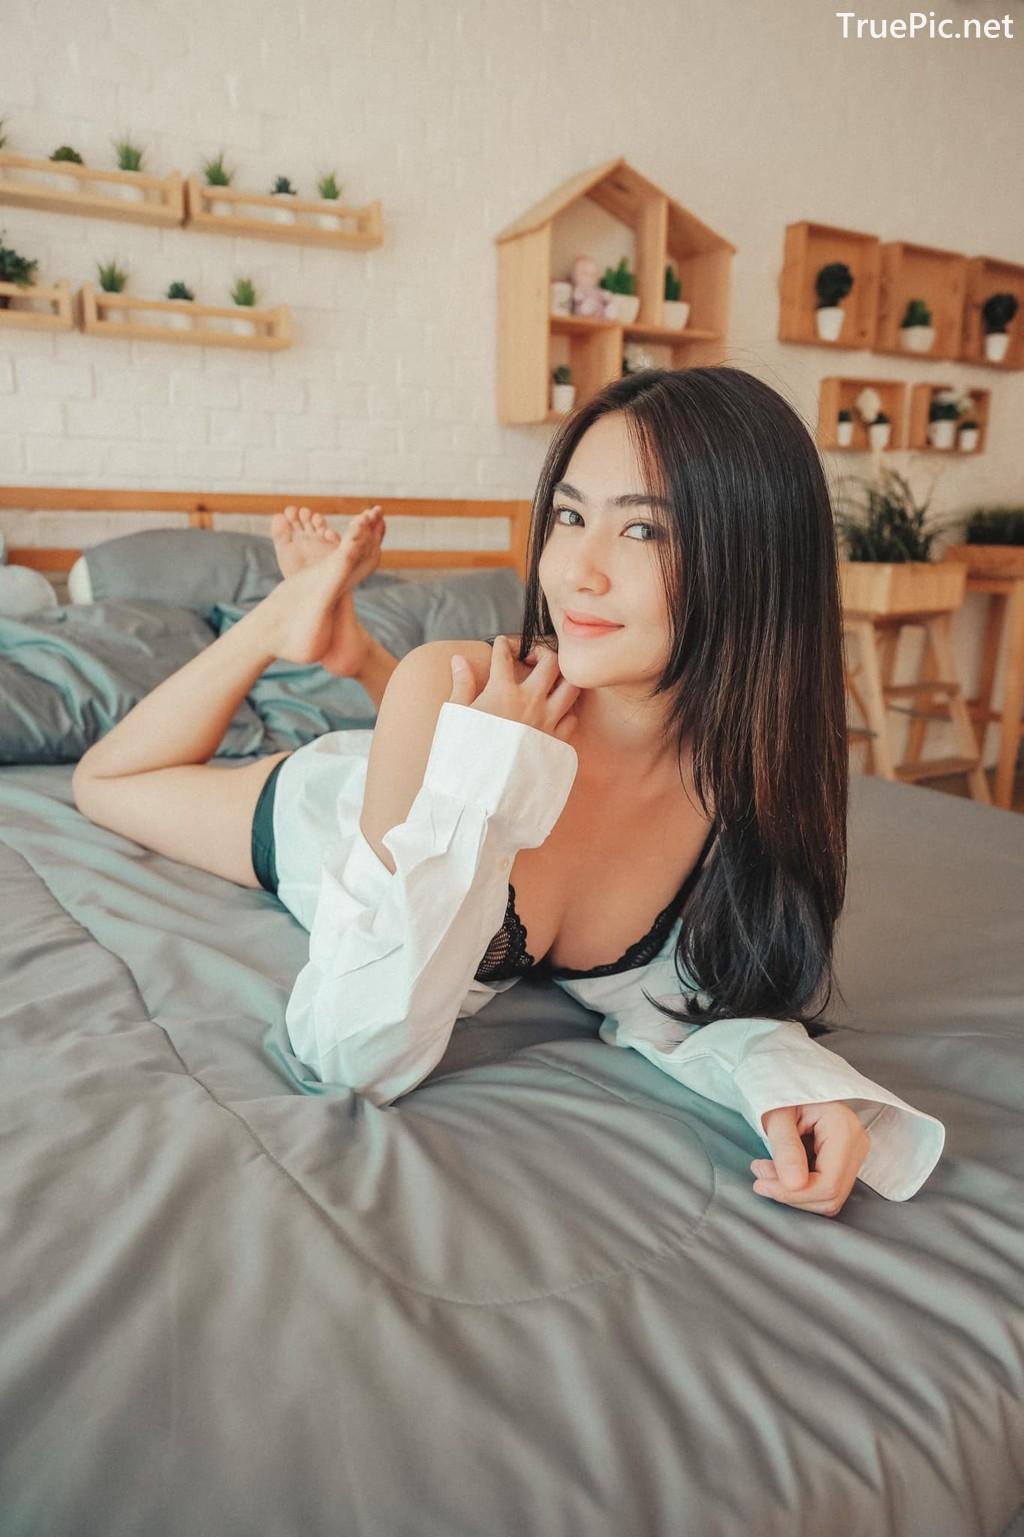 Image Thailand Sexy Model – Baifern Rinrucha Kamnark – Black Lingerie - TruePic.net - Picture-5